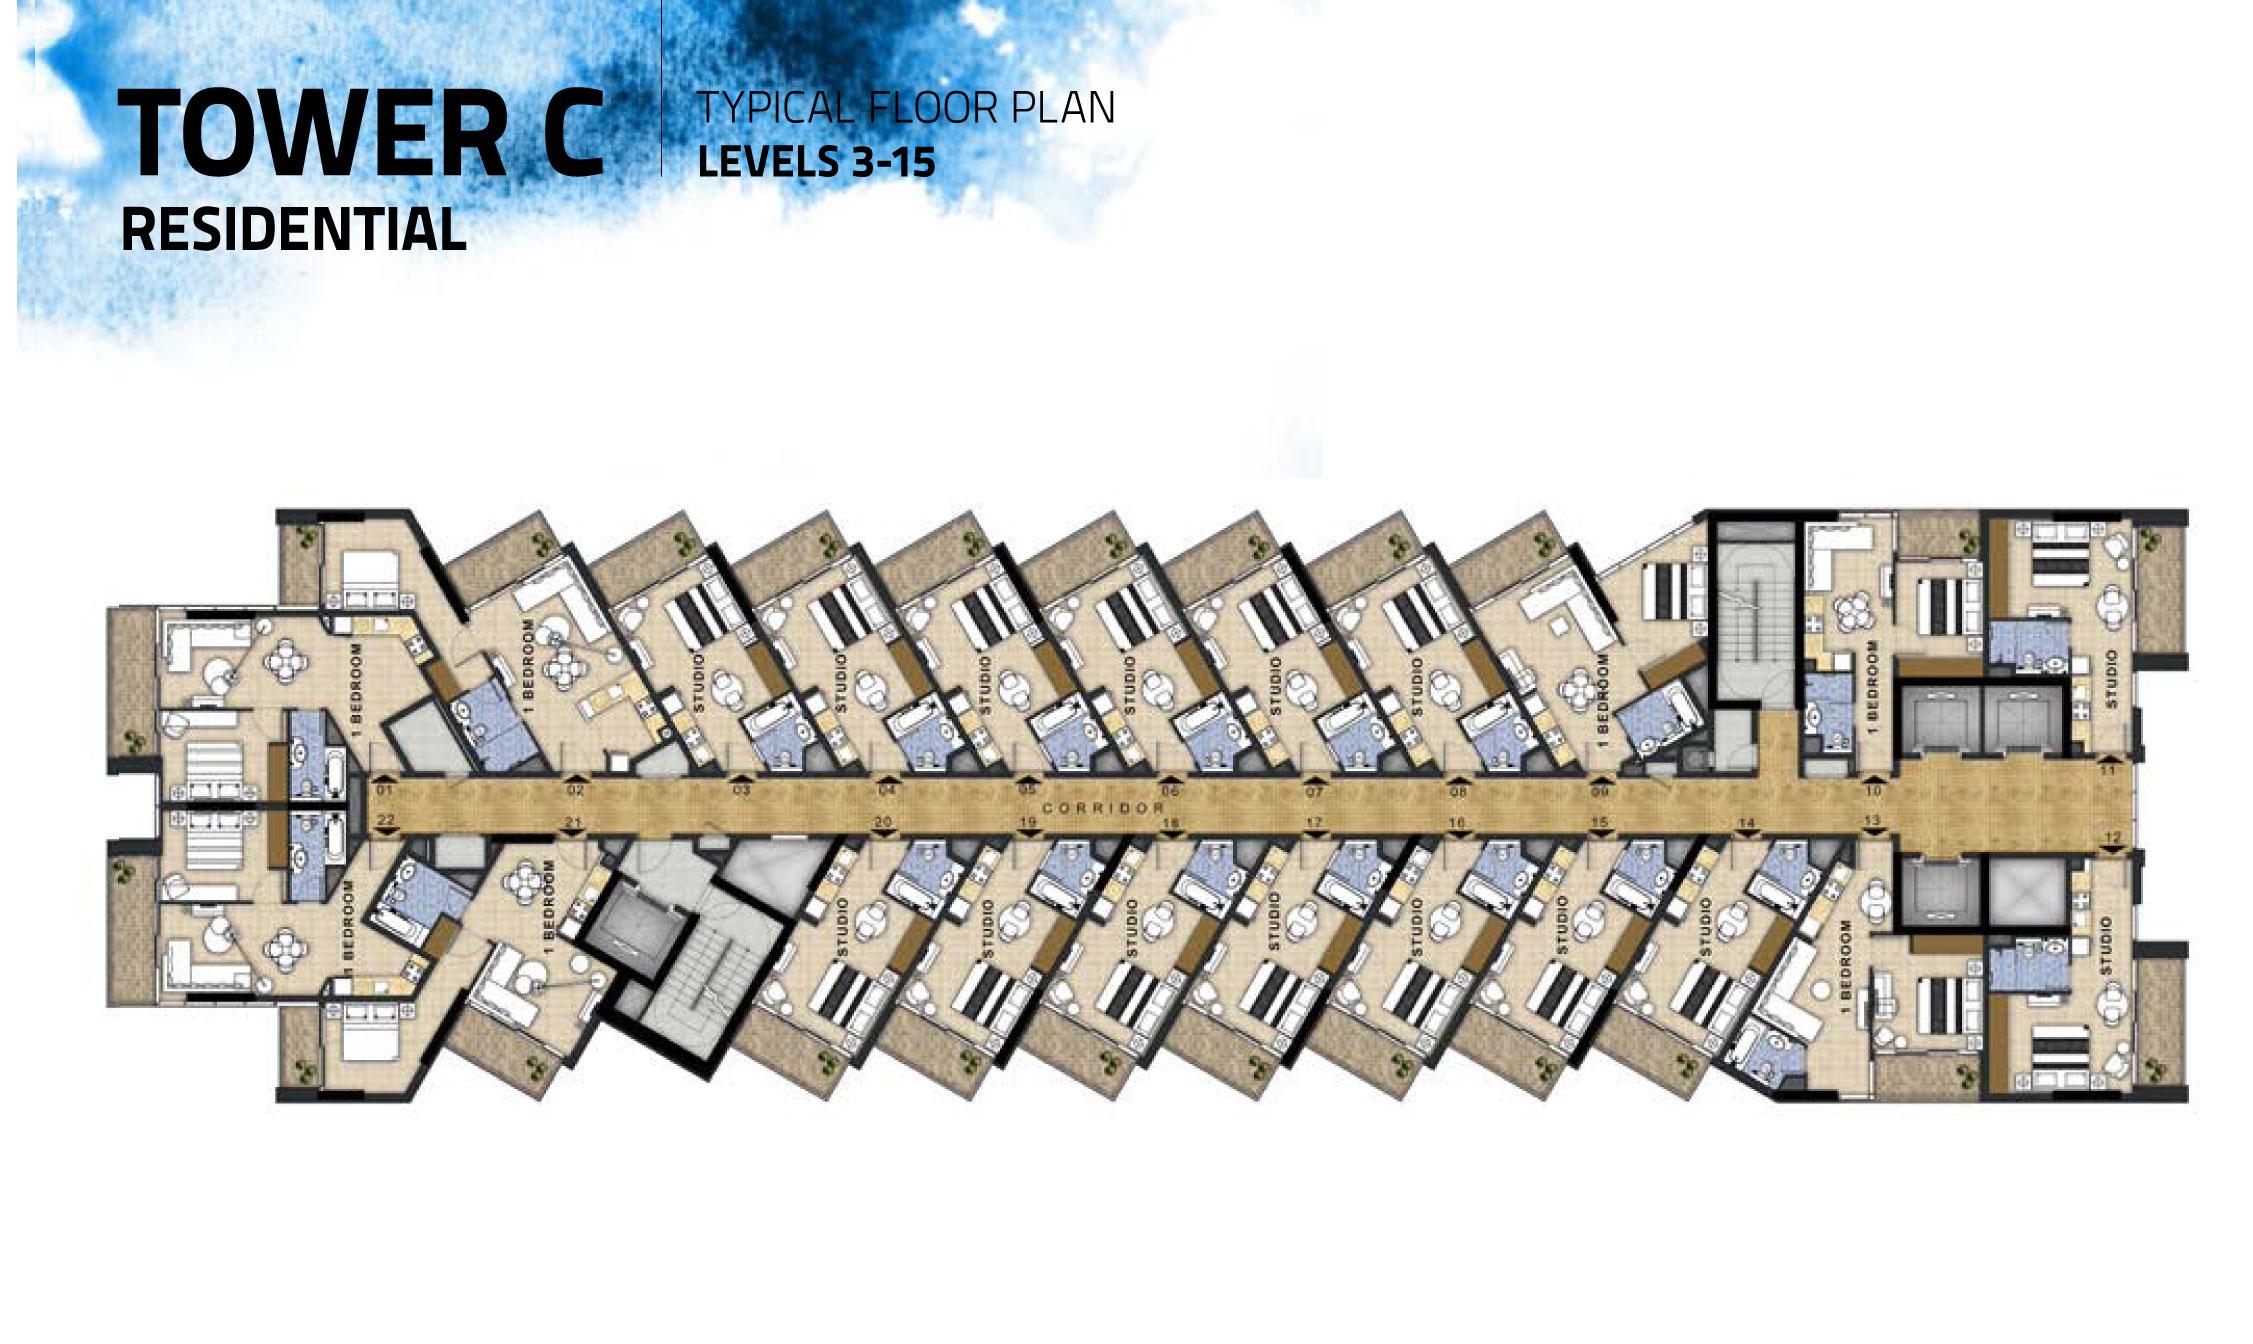 Tower-C-Level-3-15